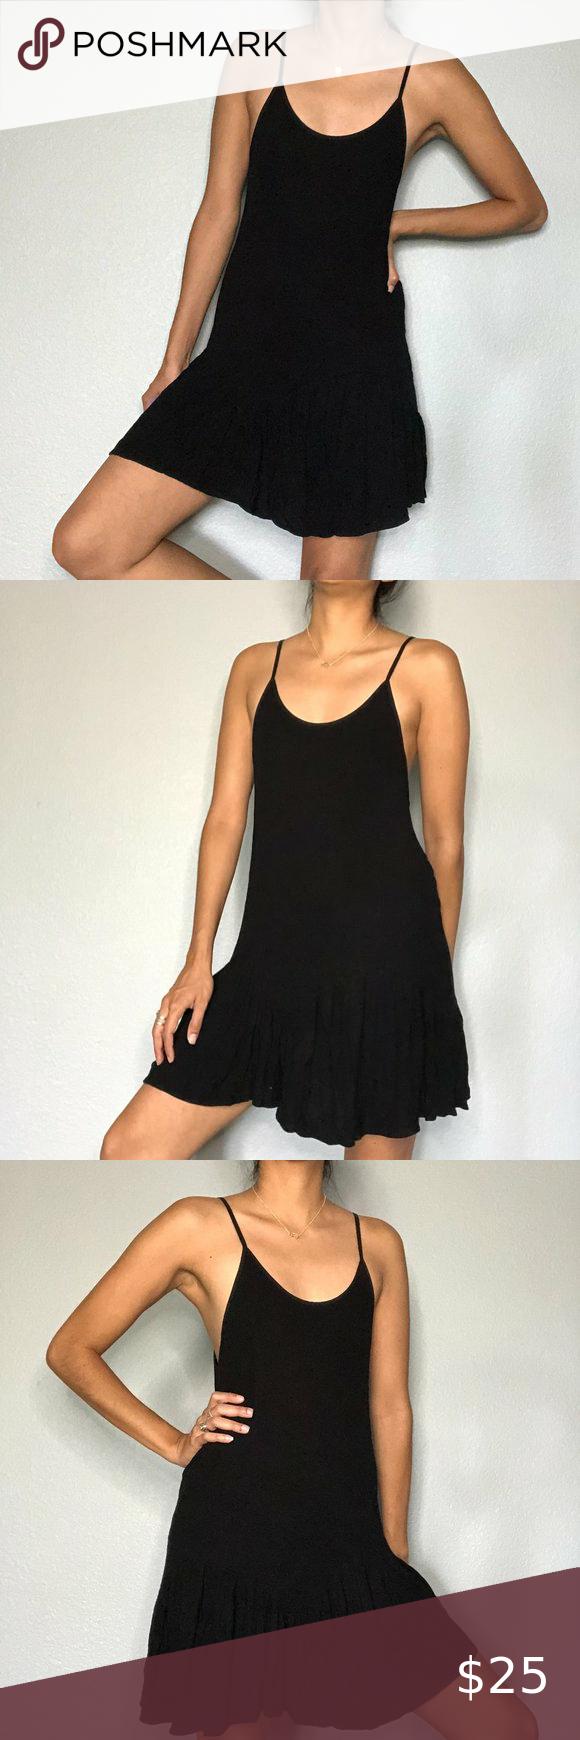 Zara Trafaluc Tank Ruffle Black Dress Size M Black Ruffle Dress Black Cami Dress Black Dress [ 1740 x 580 Pixel ]